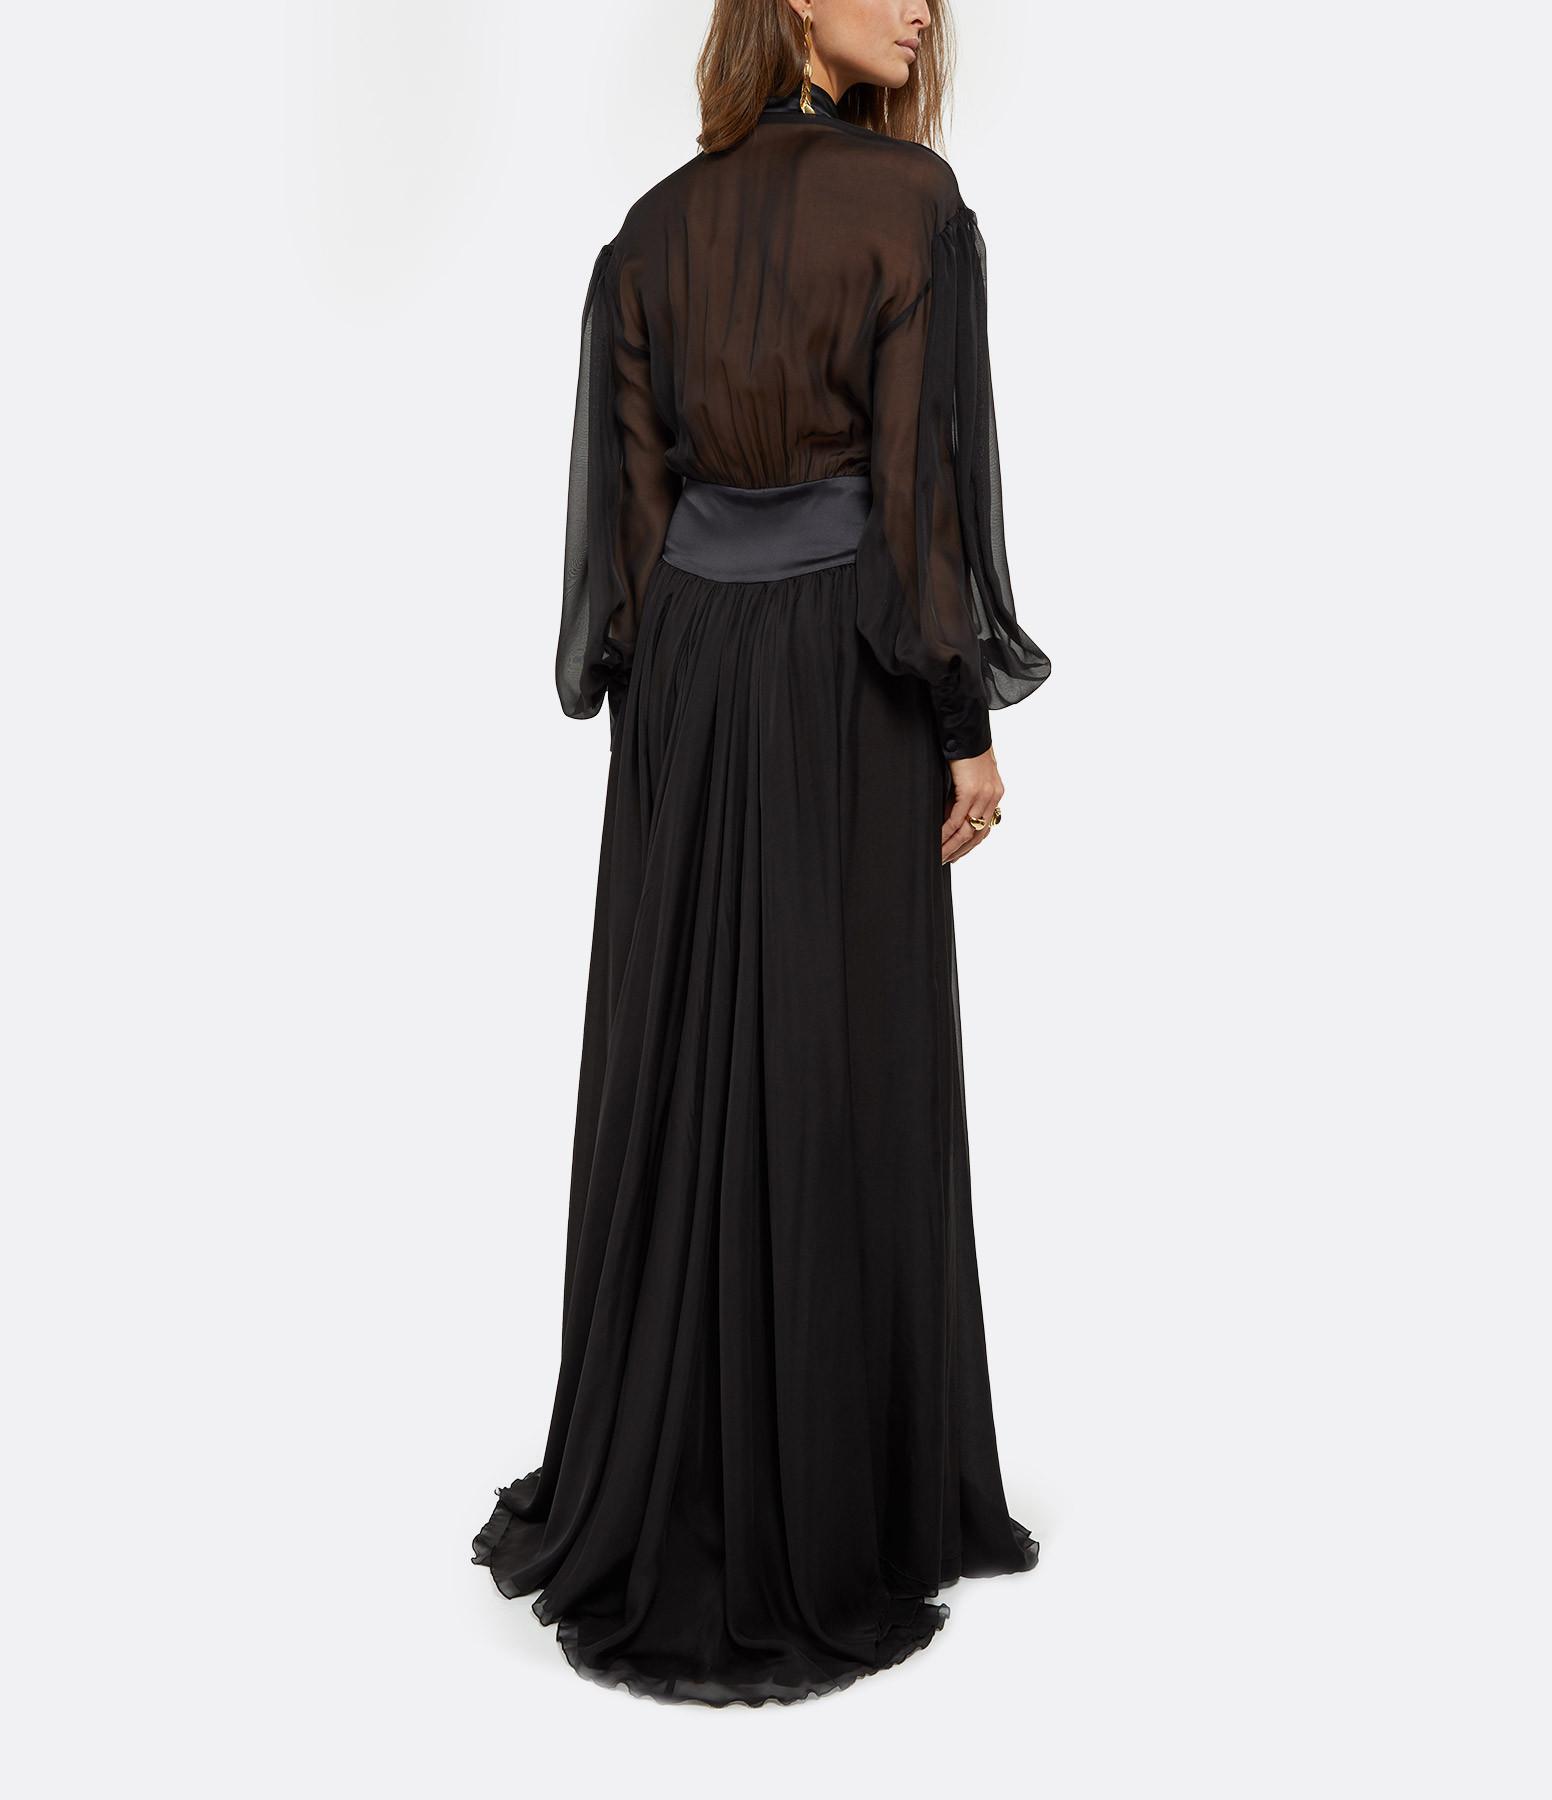 OUD - Robe Romane Soie Noir